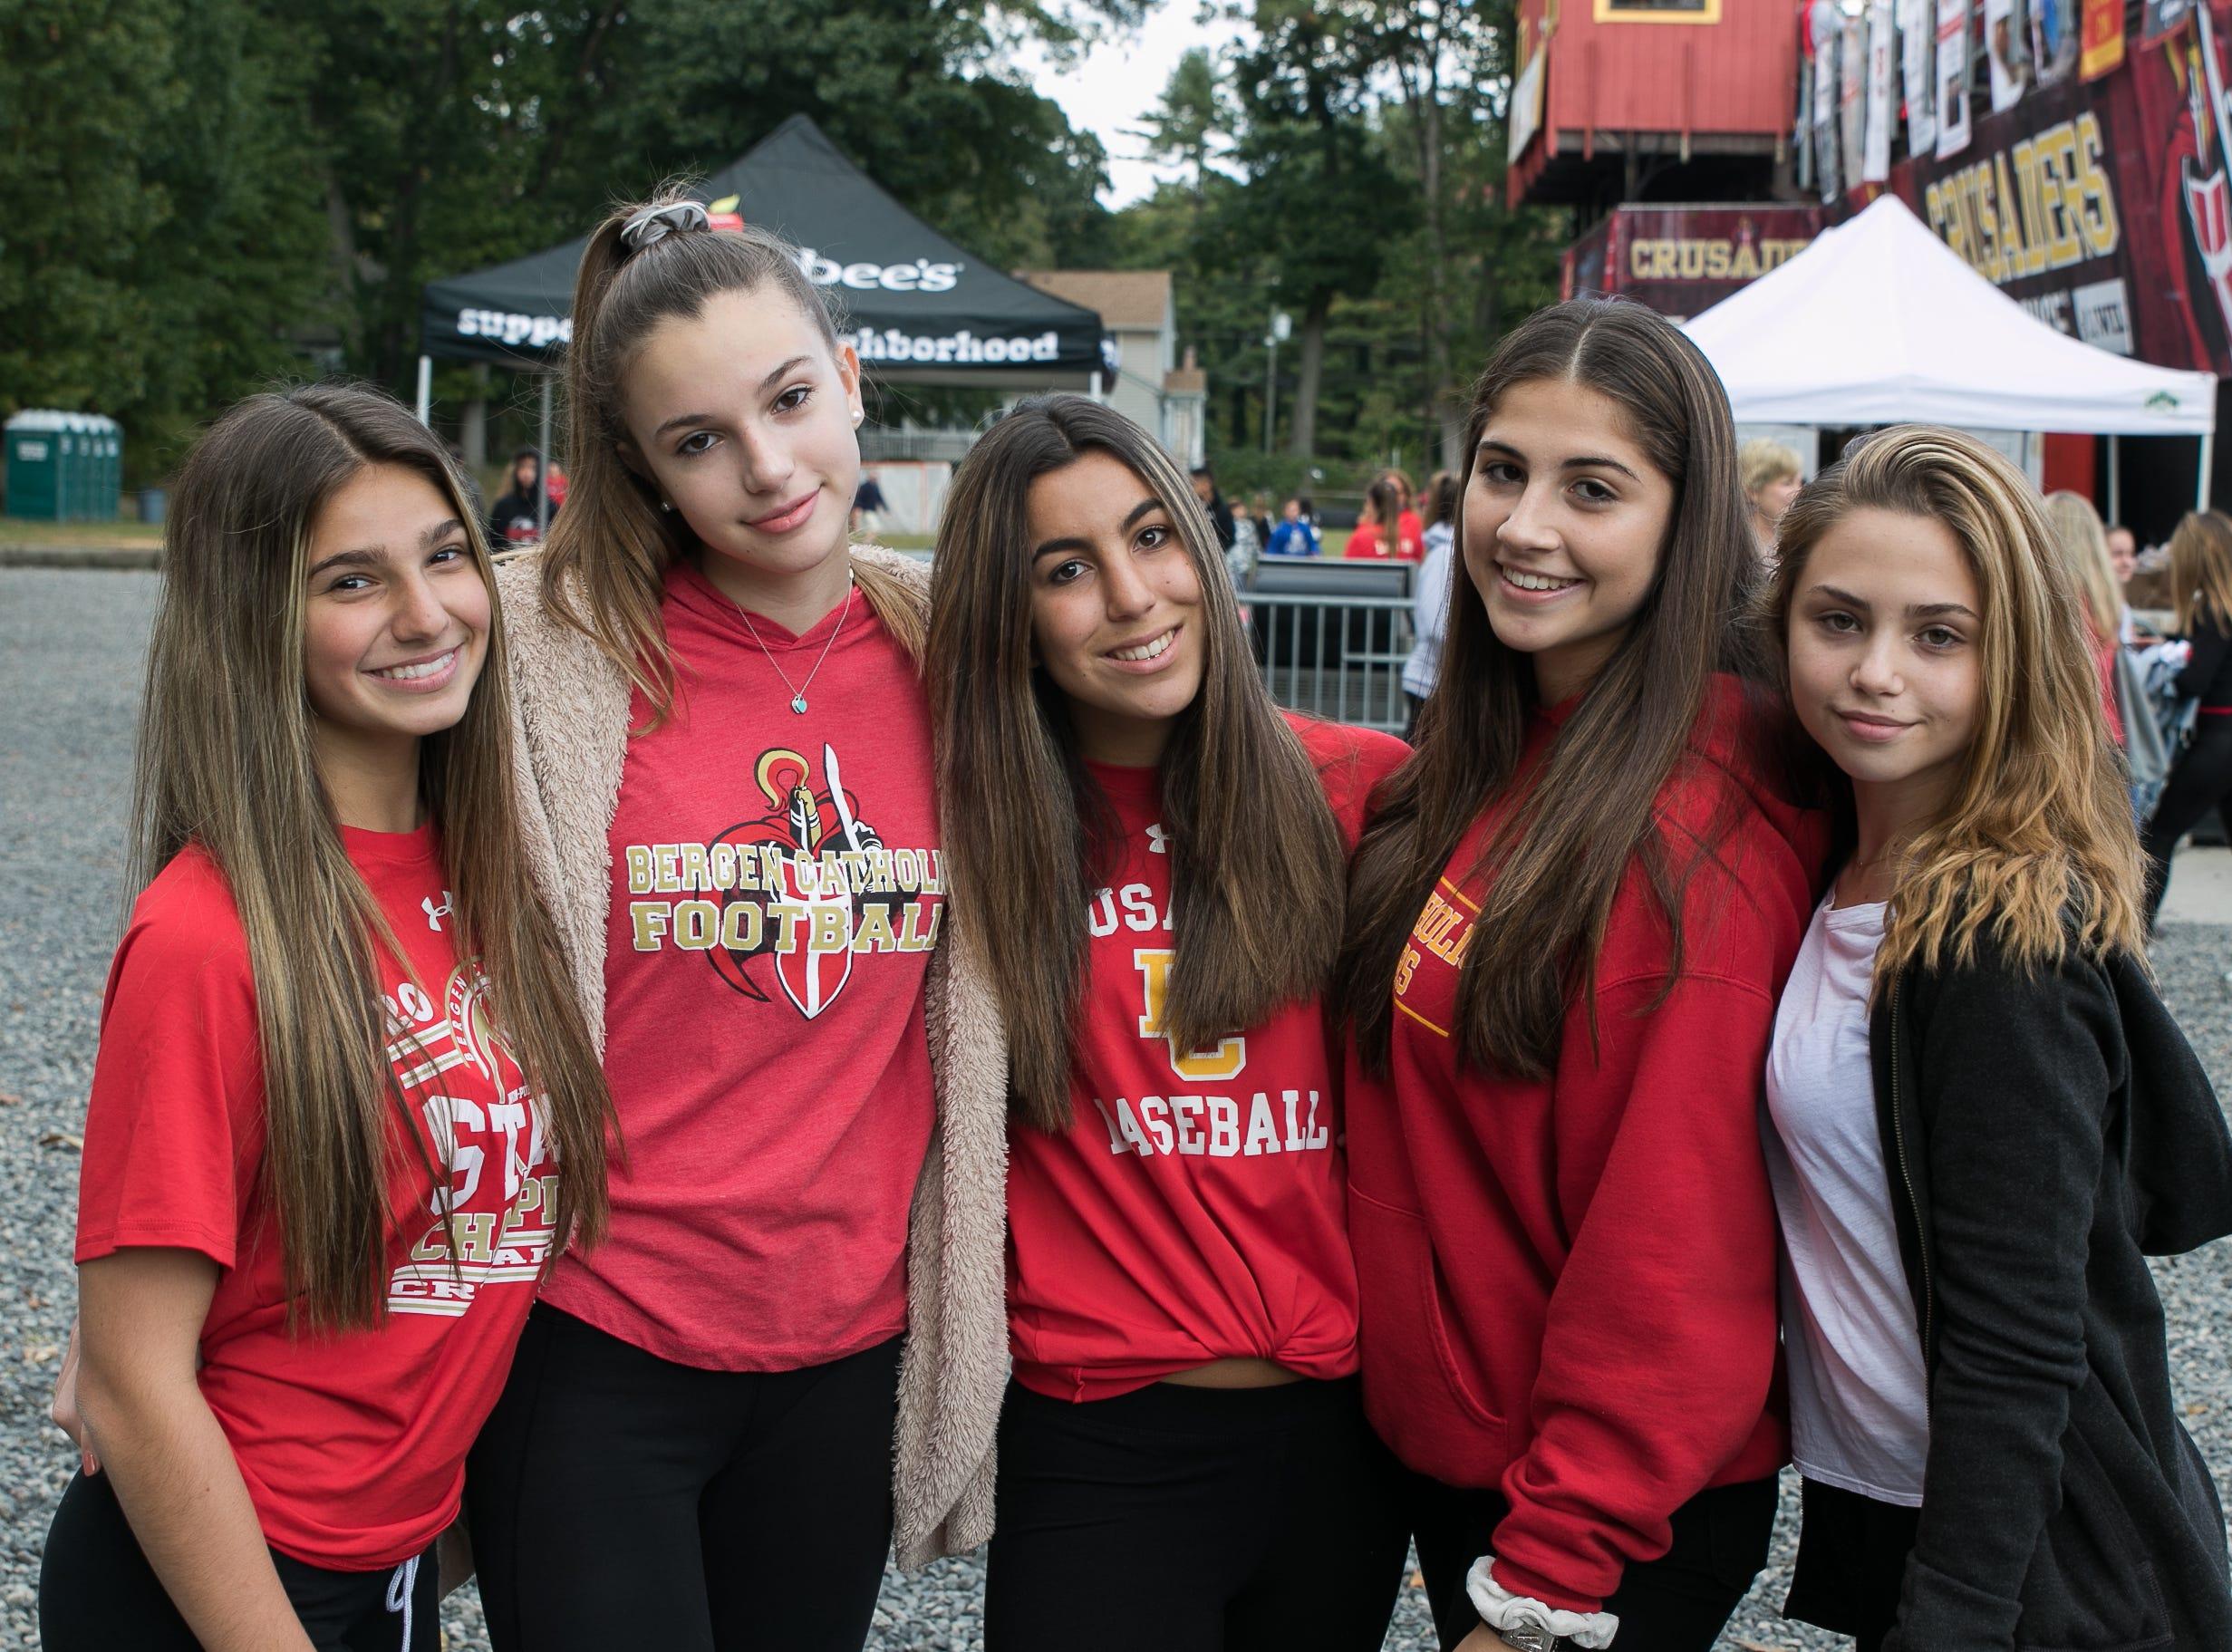 Fans at the Bergen Catholicl verses Paramus Catholic High School Football game held at Bergen Catholic High School. 10/20/2018